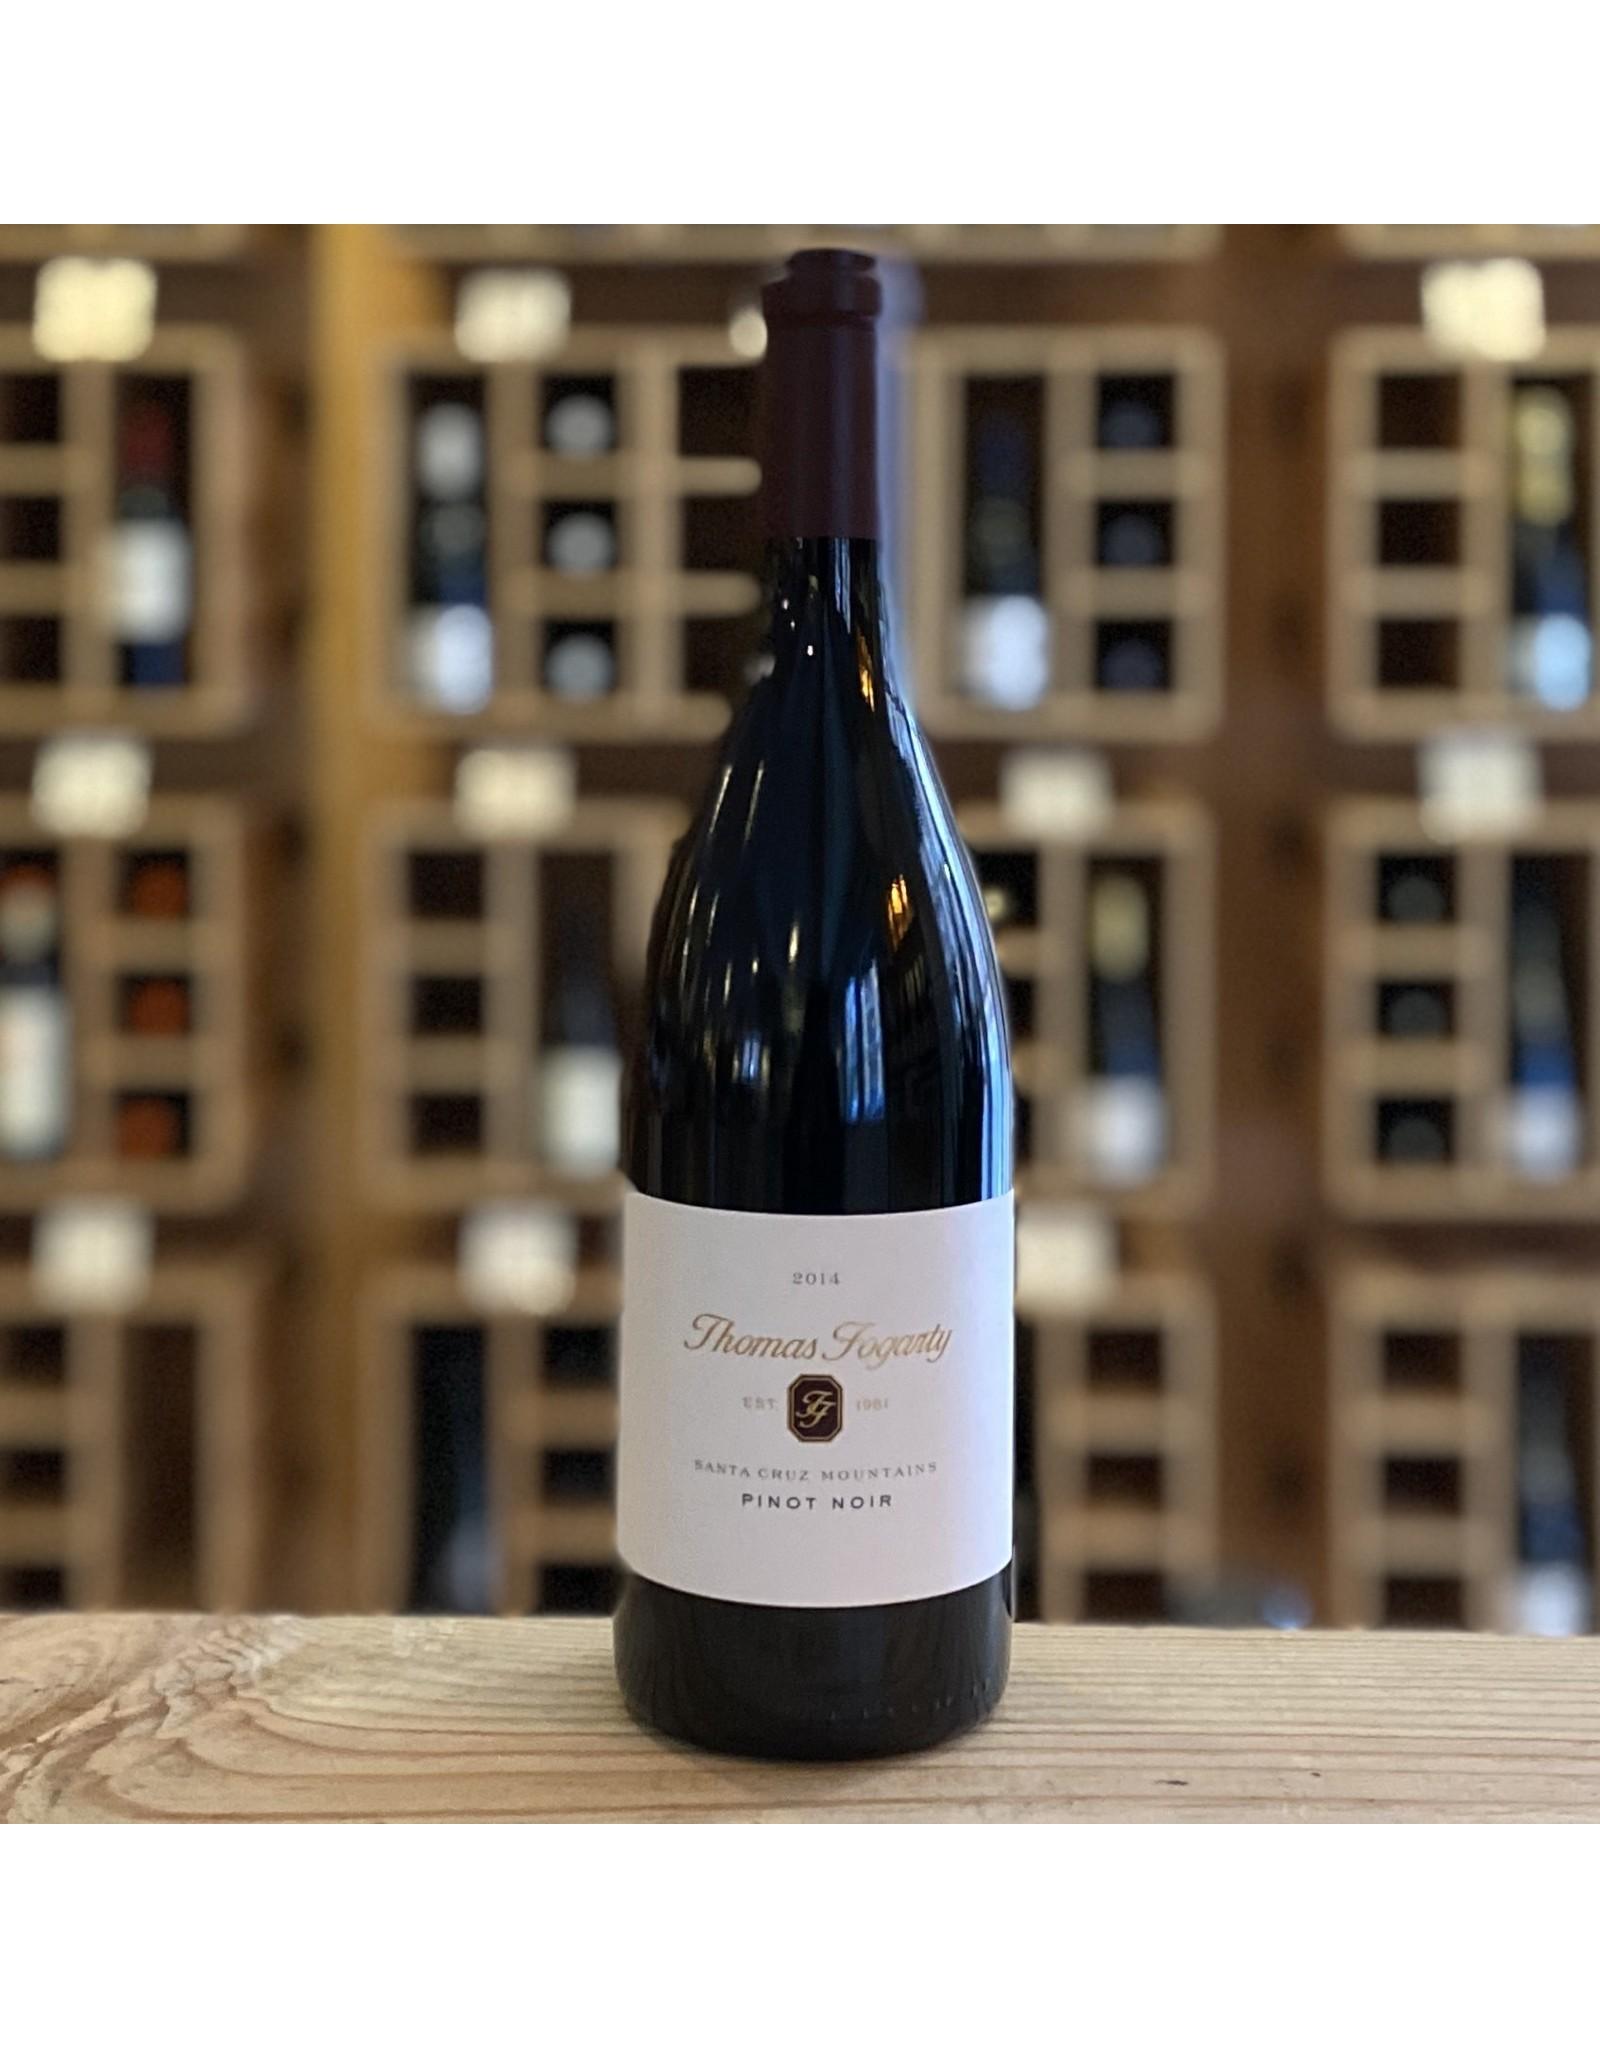 California Thomas Fogarty Pinot Noir 2014 - Santa Cruz Mountains, CA